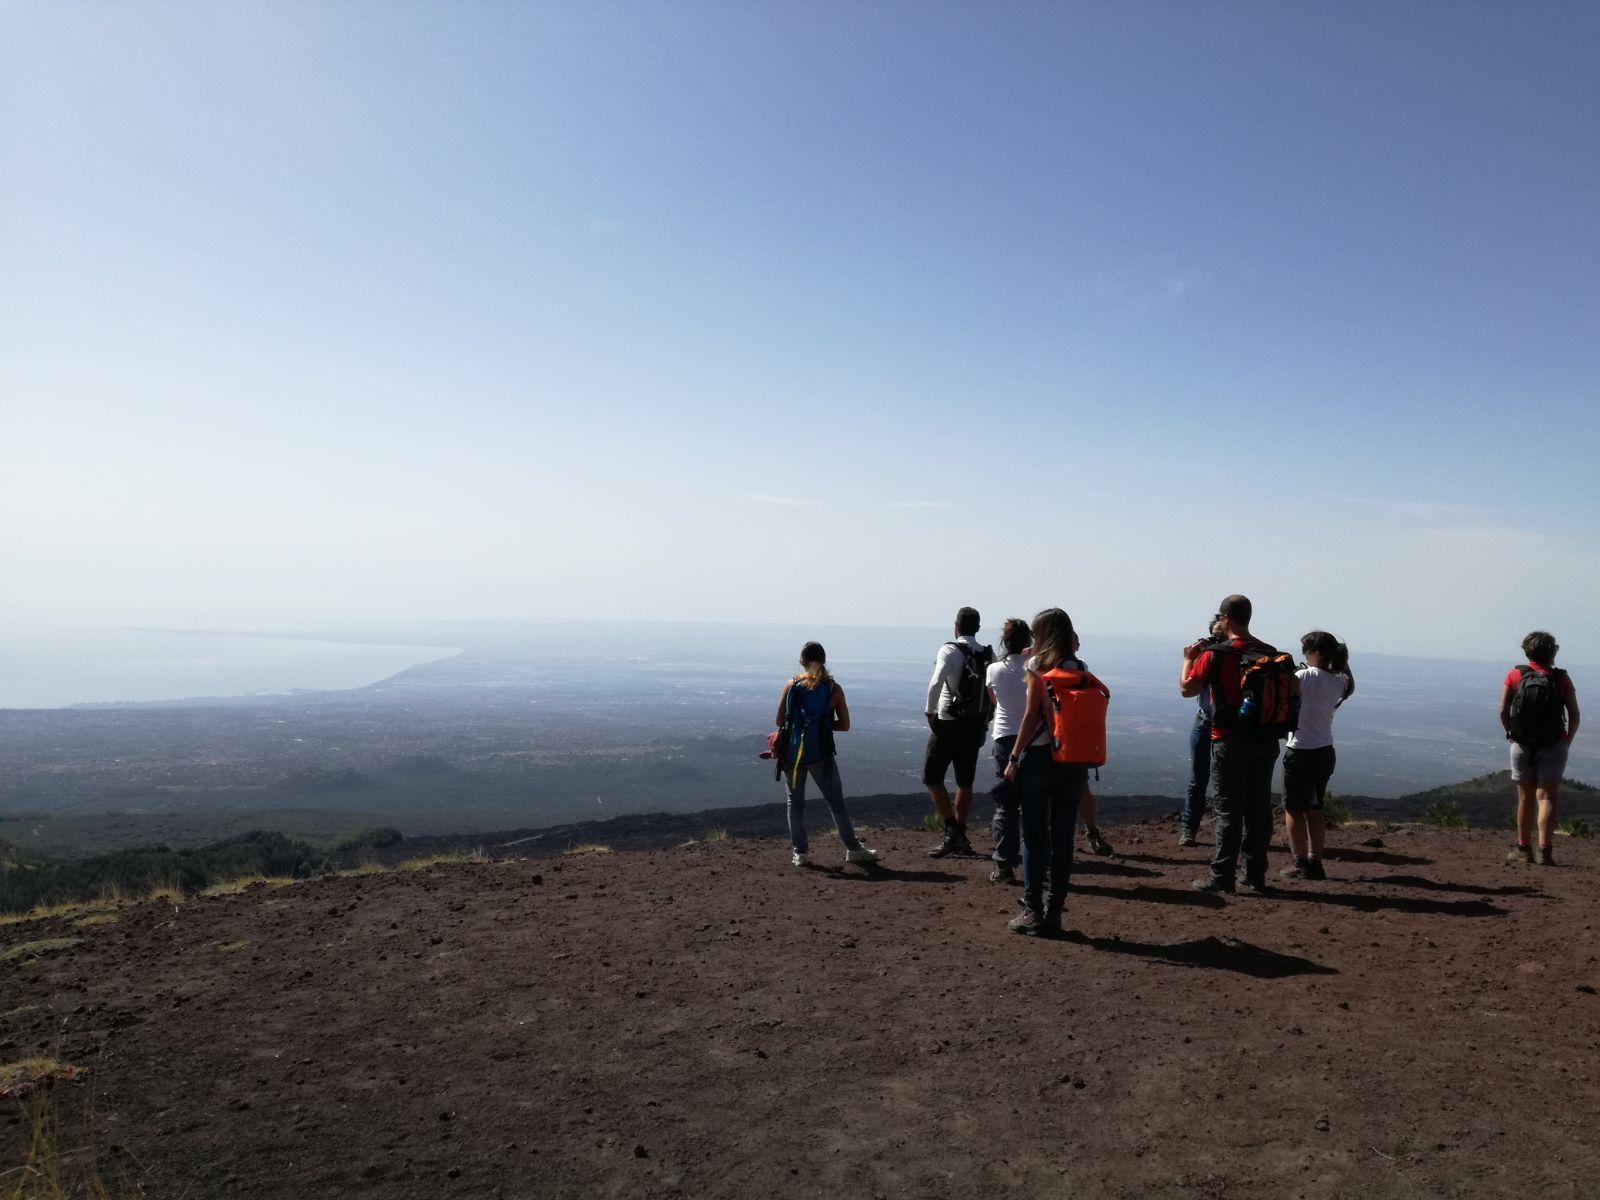 Etna – Hiking the Path of the Donkey's Back. Valle del Bove e Schiena dell'Asino